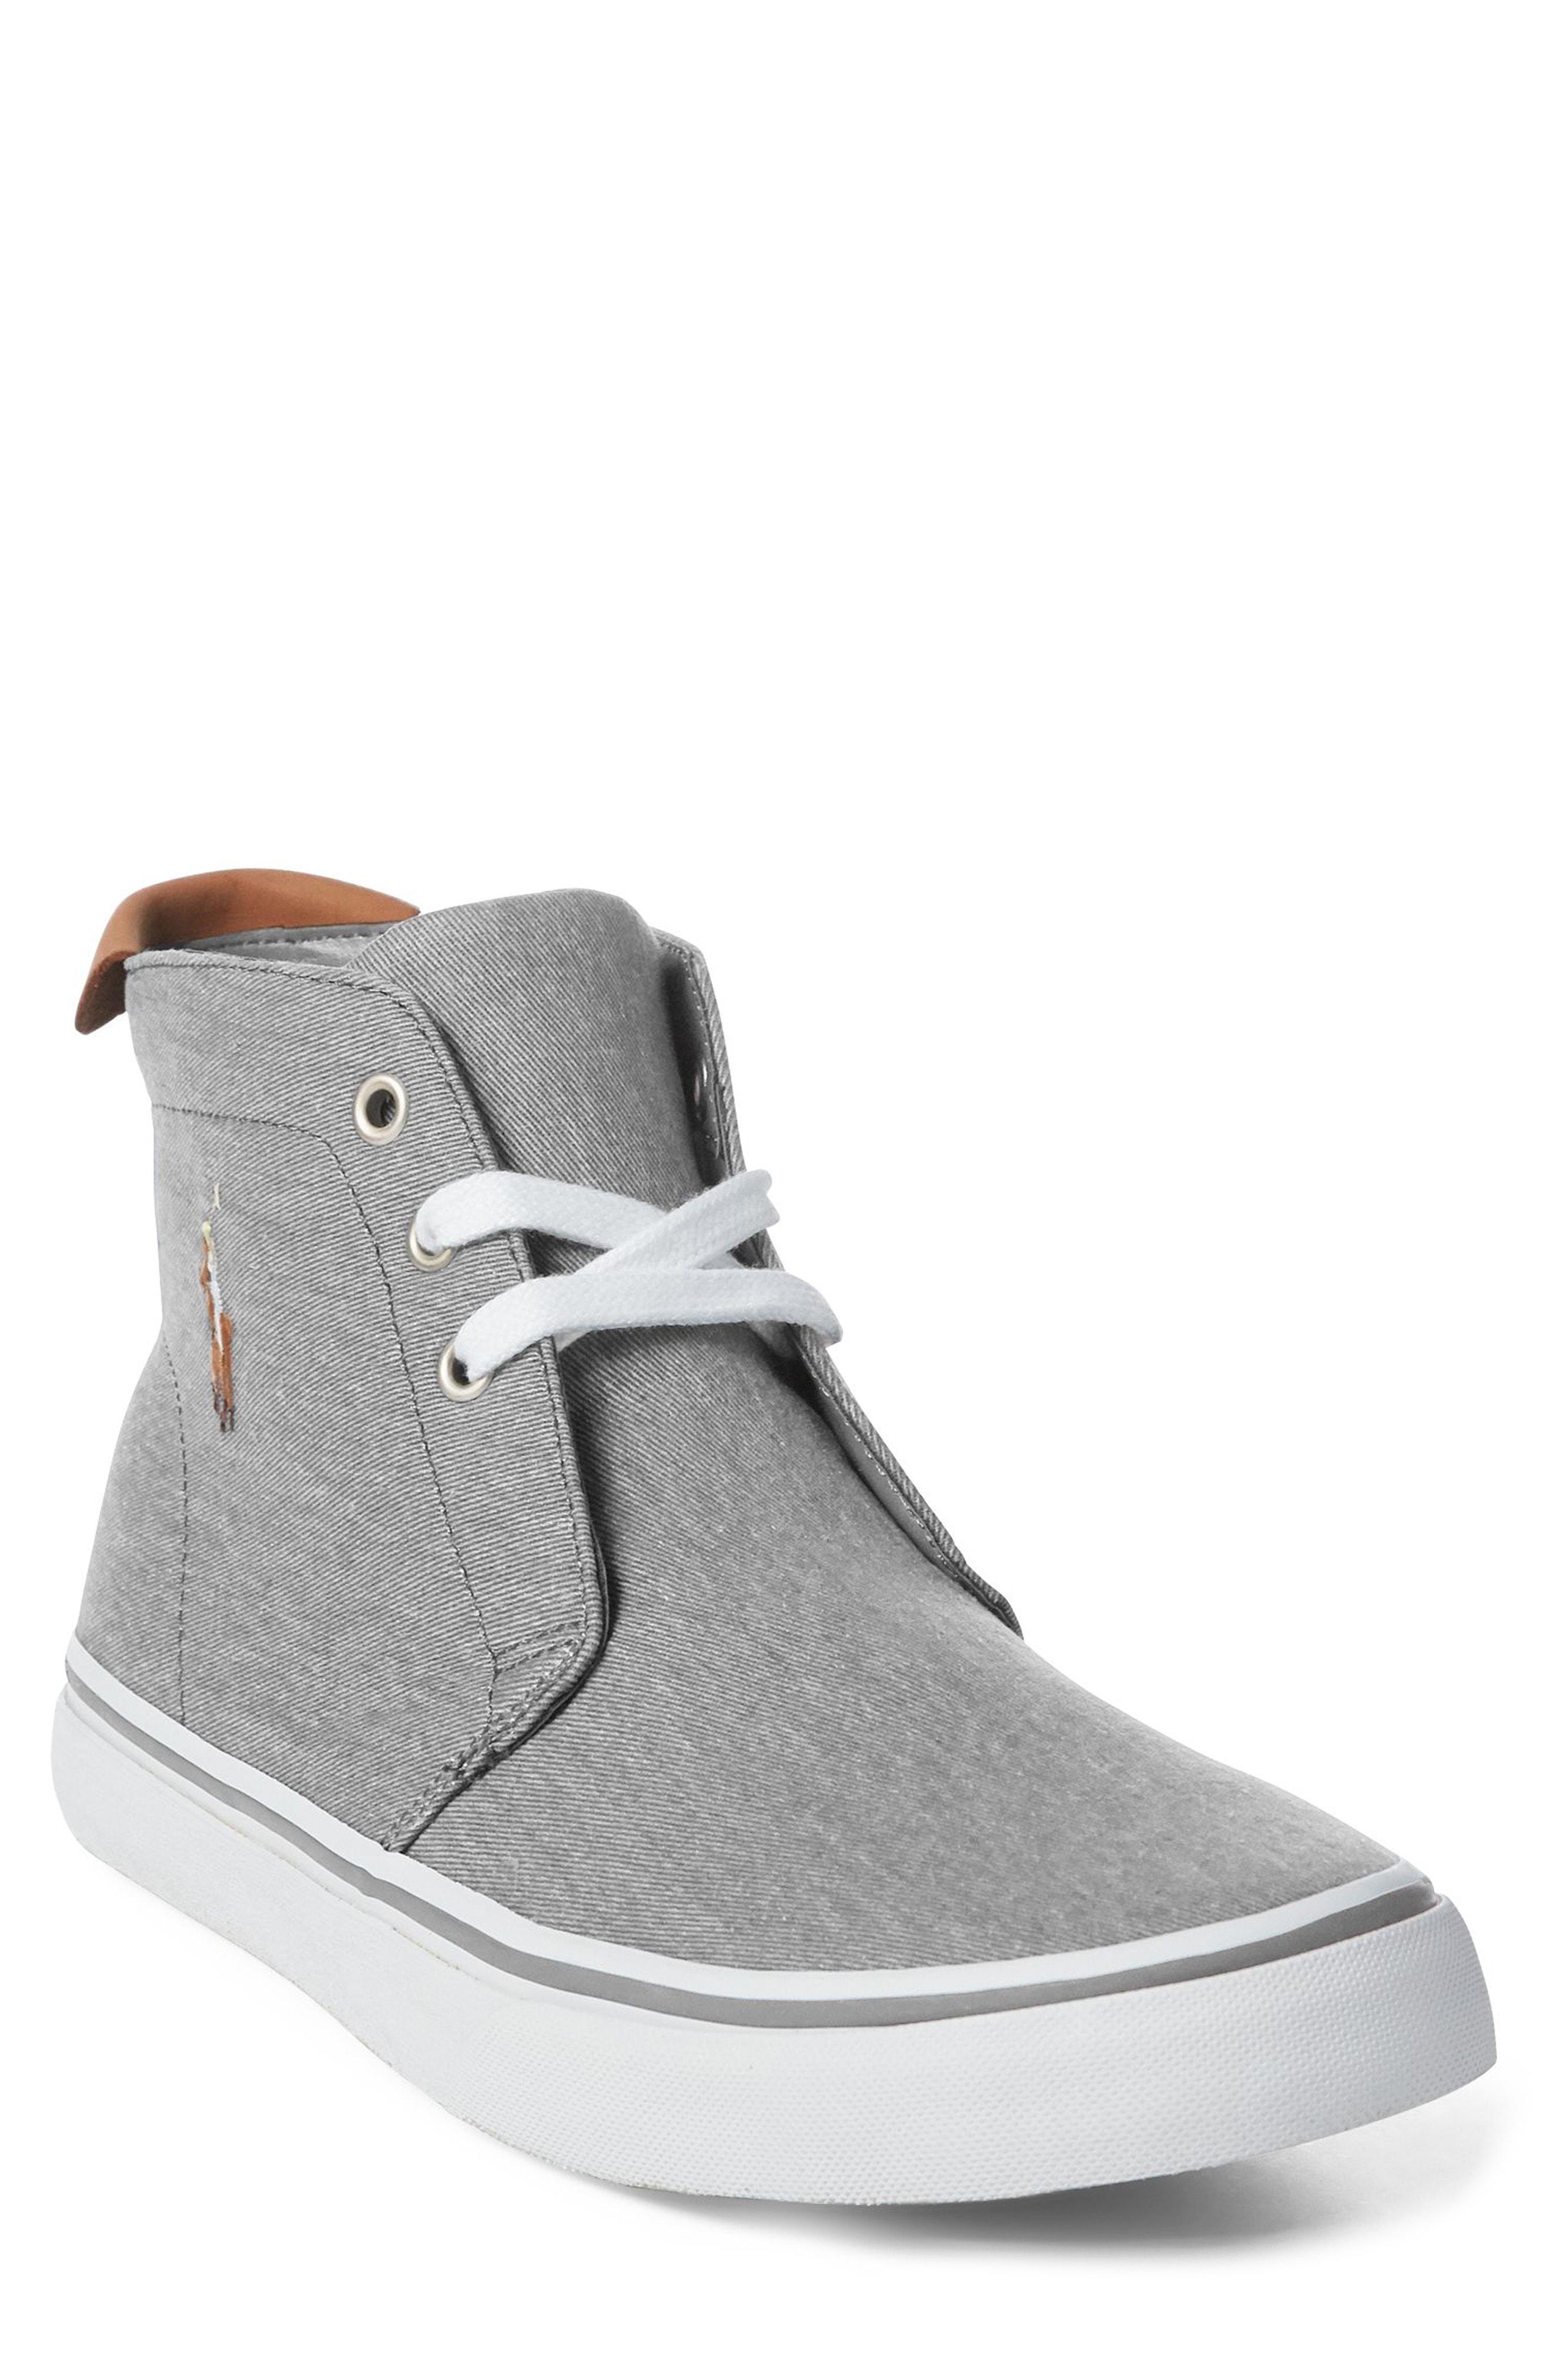 Ralph Talin Lauren Polo Blue Embroidered Sneaker Boot menIn Lyst n0wvNm8